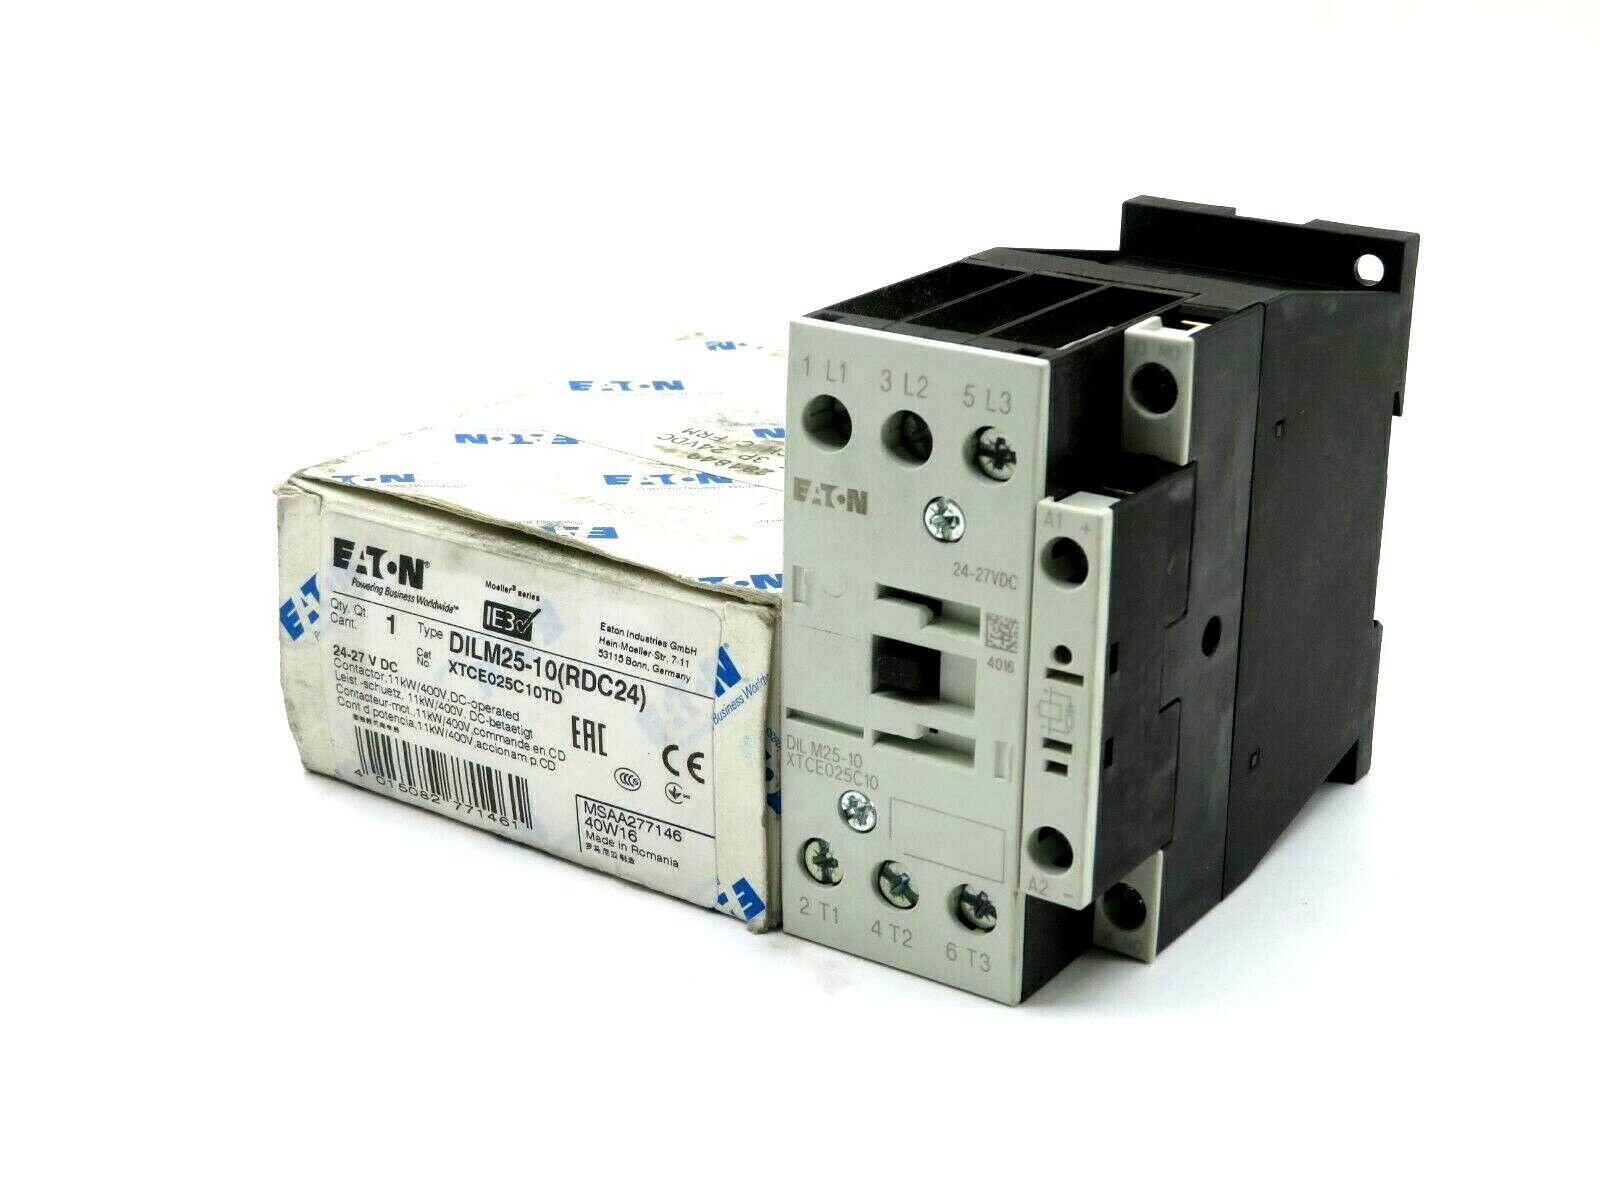 110V50Hz #F0 110V50Hz 1PC New EATON DILM25-10C DILM2510C